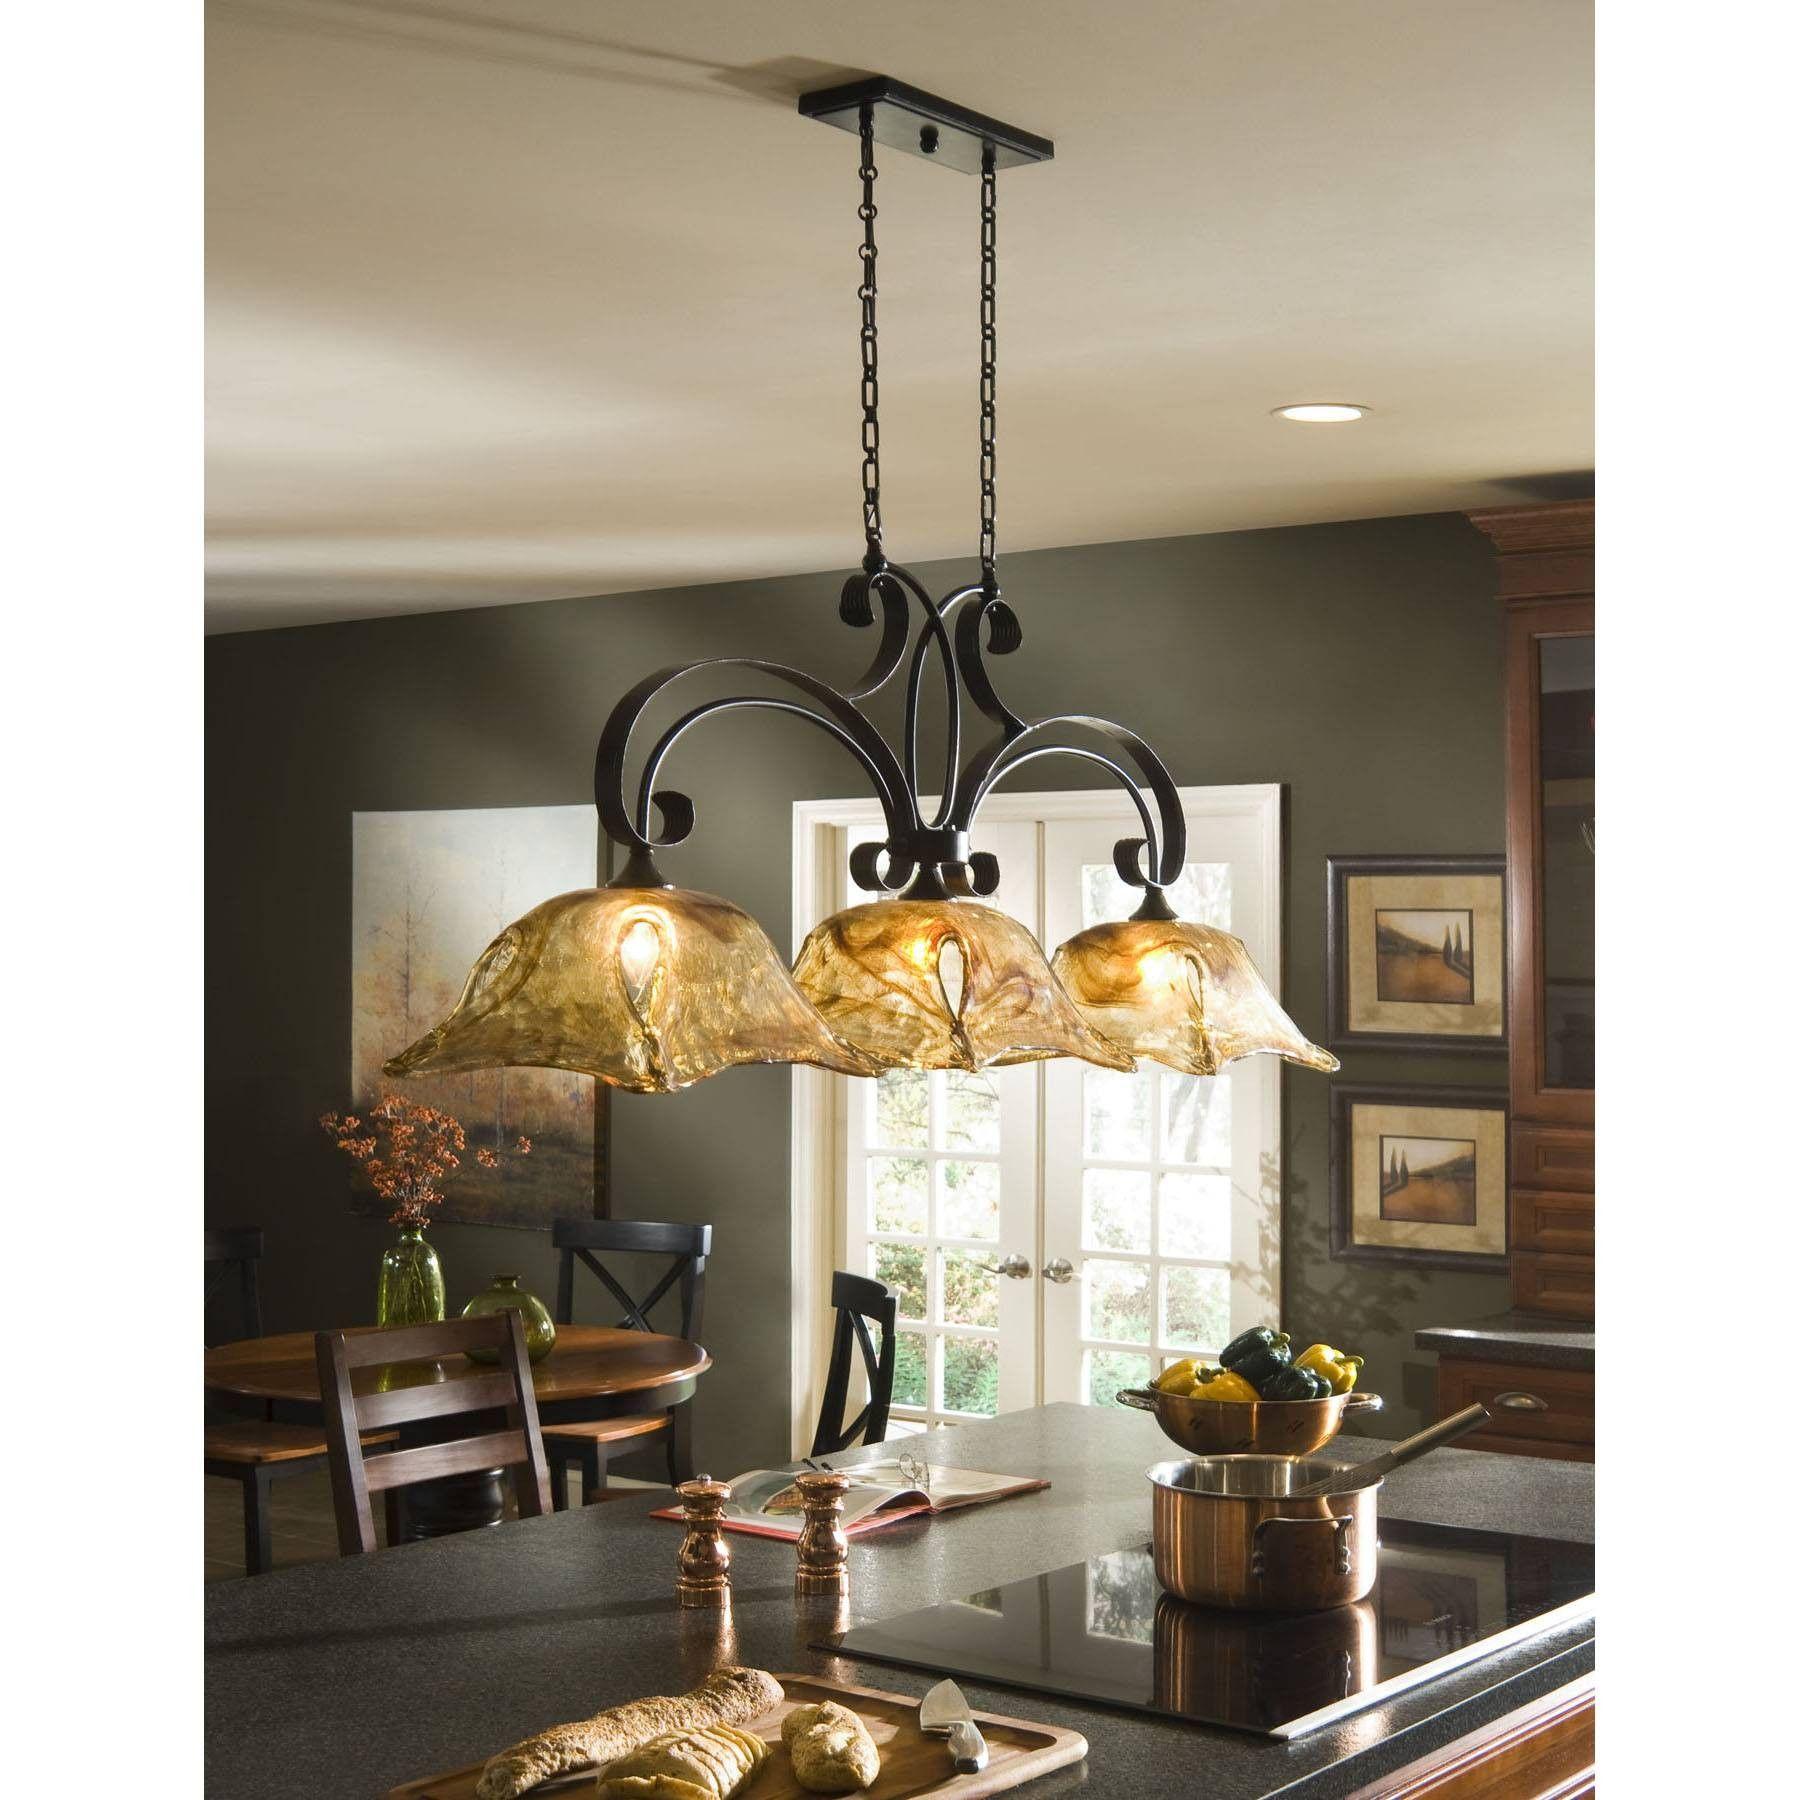 The Best Wrought Iron Kitchen Lighting